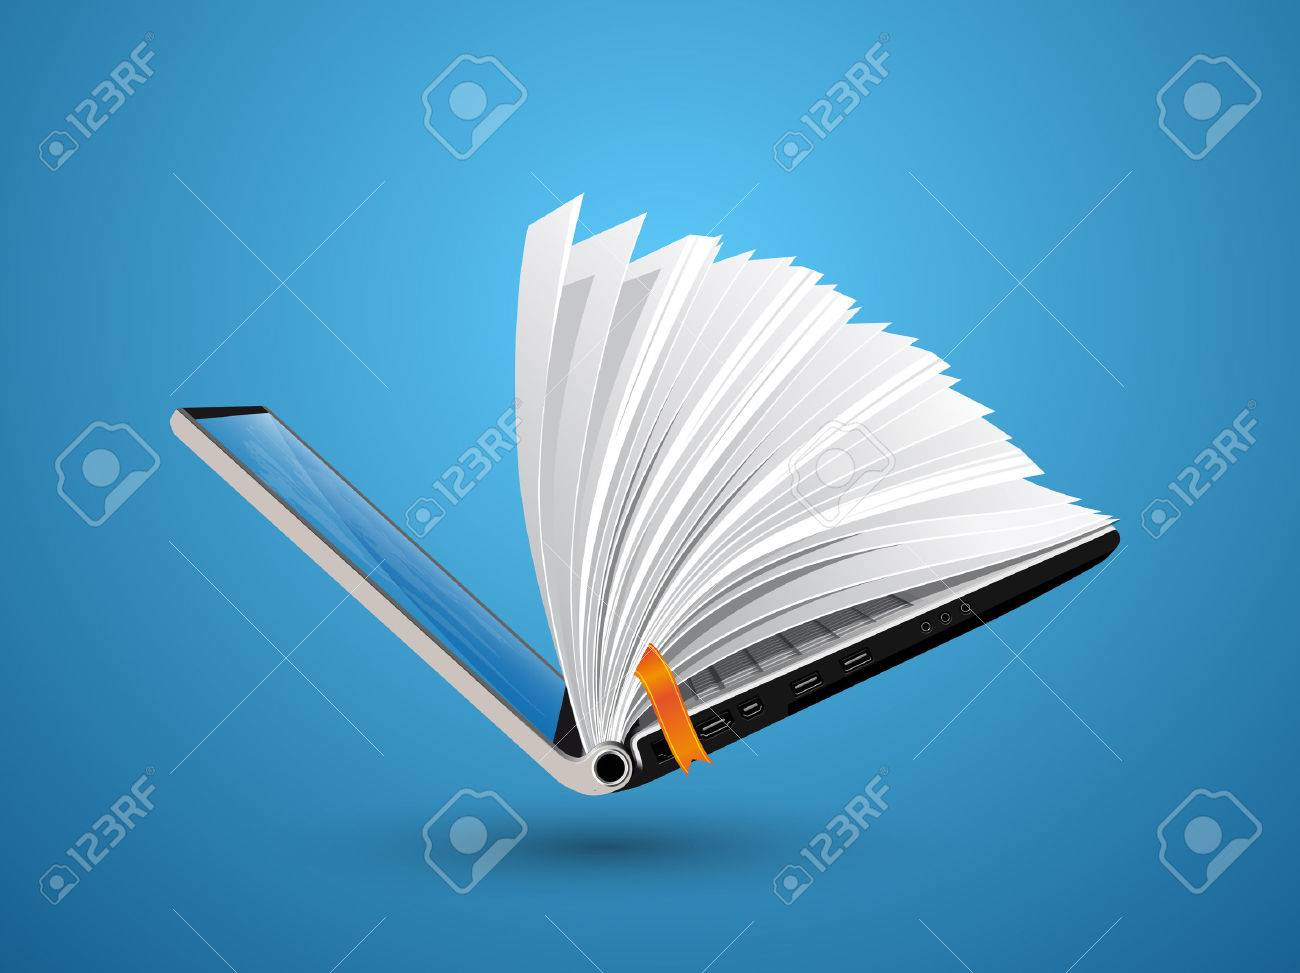 IT Communication - knowledge base, e-learning, e-book - 55519492